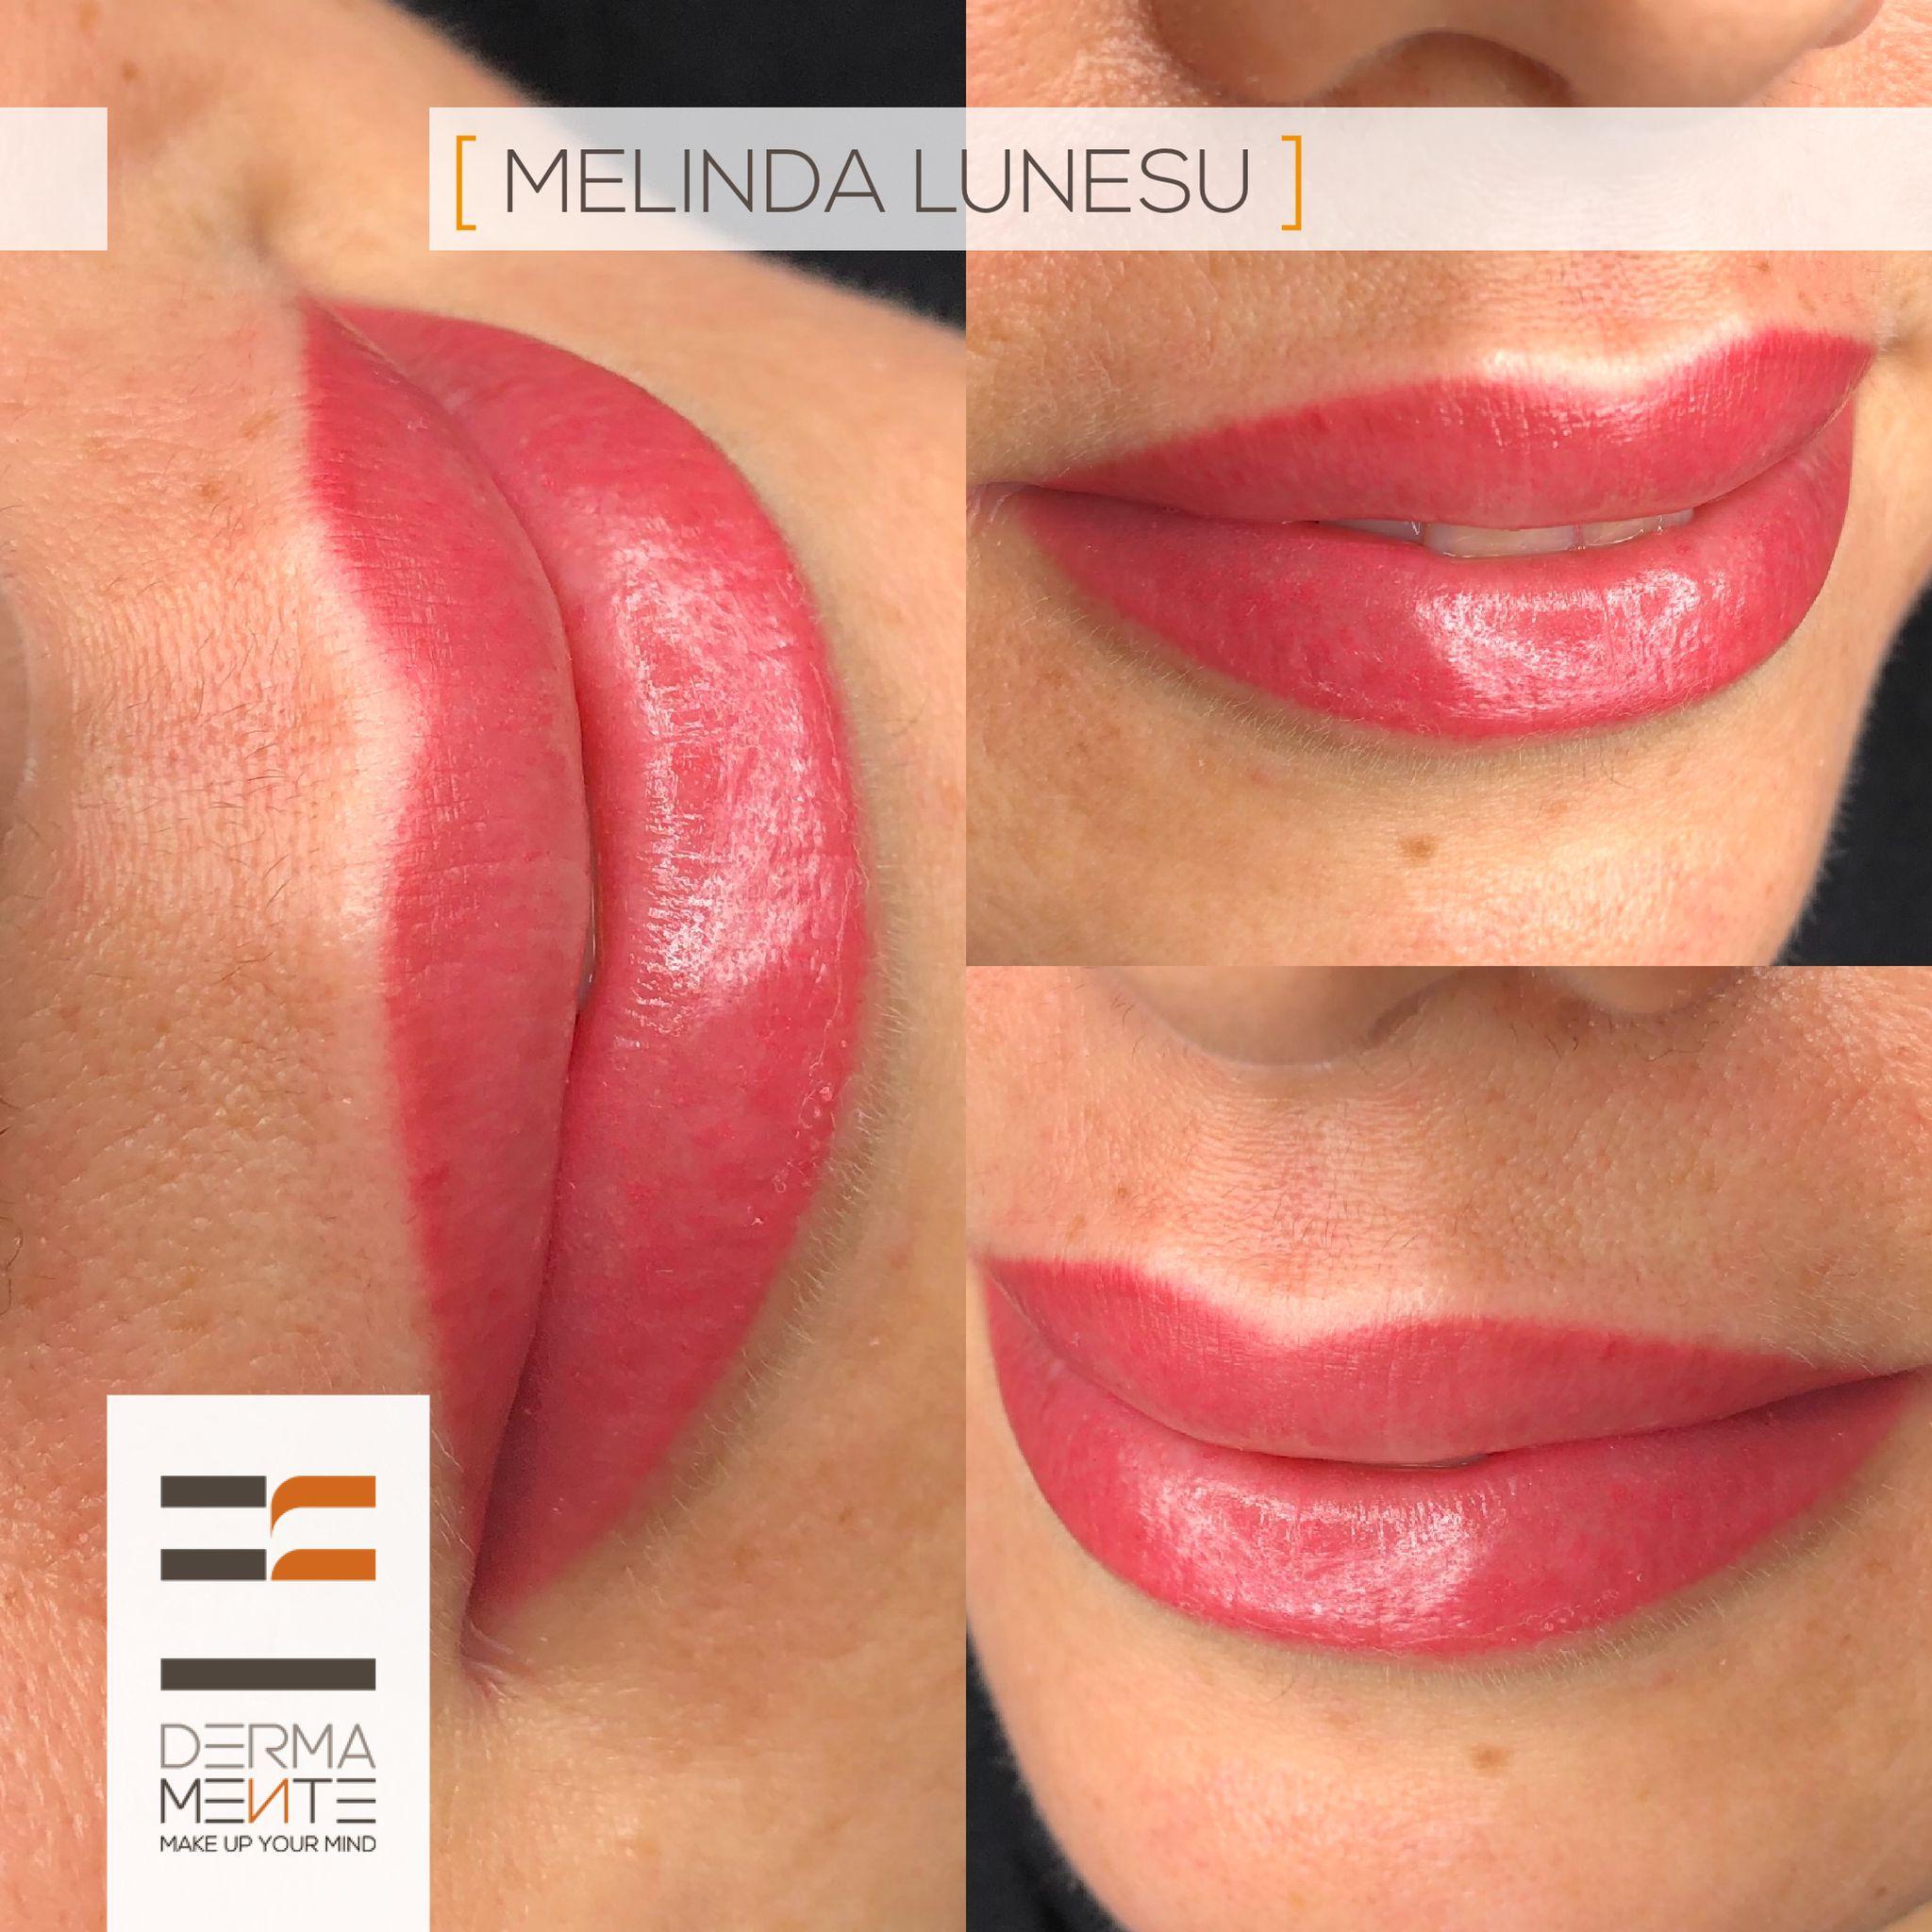 Melinda Lunesu - PMU Lips Cagliari - Galleria lavori -3